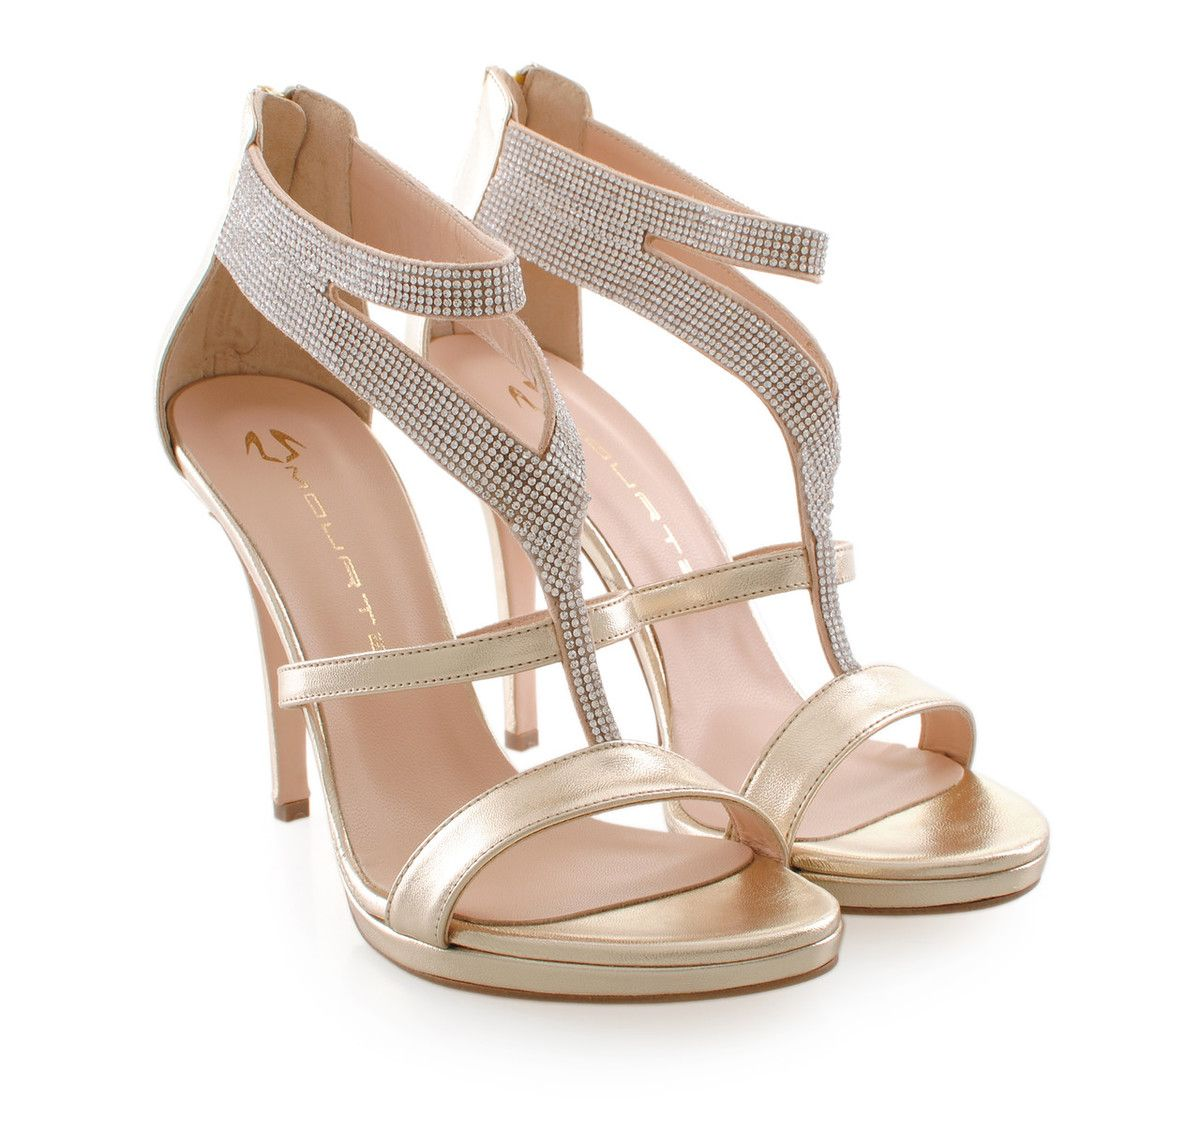 MOURTZI Gold Leather High-Heel Sandals. Γυναικεία χρυσά δερμάτινα  ψηλοτάκουνα πέδιλα.